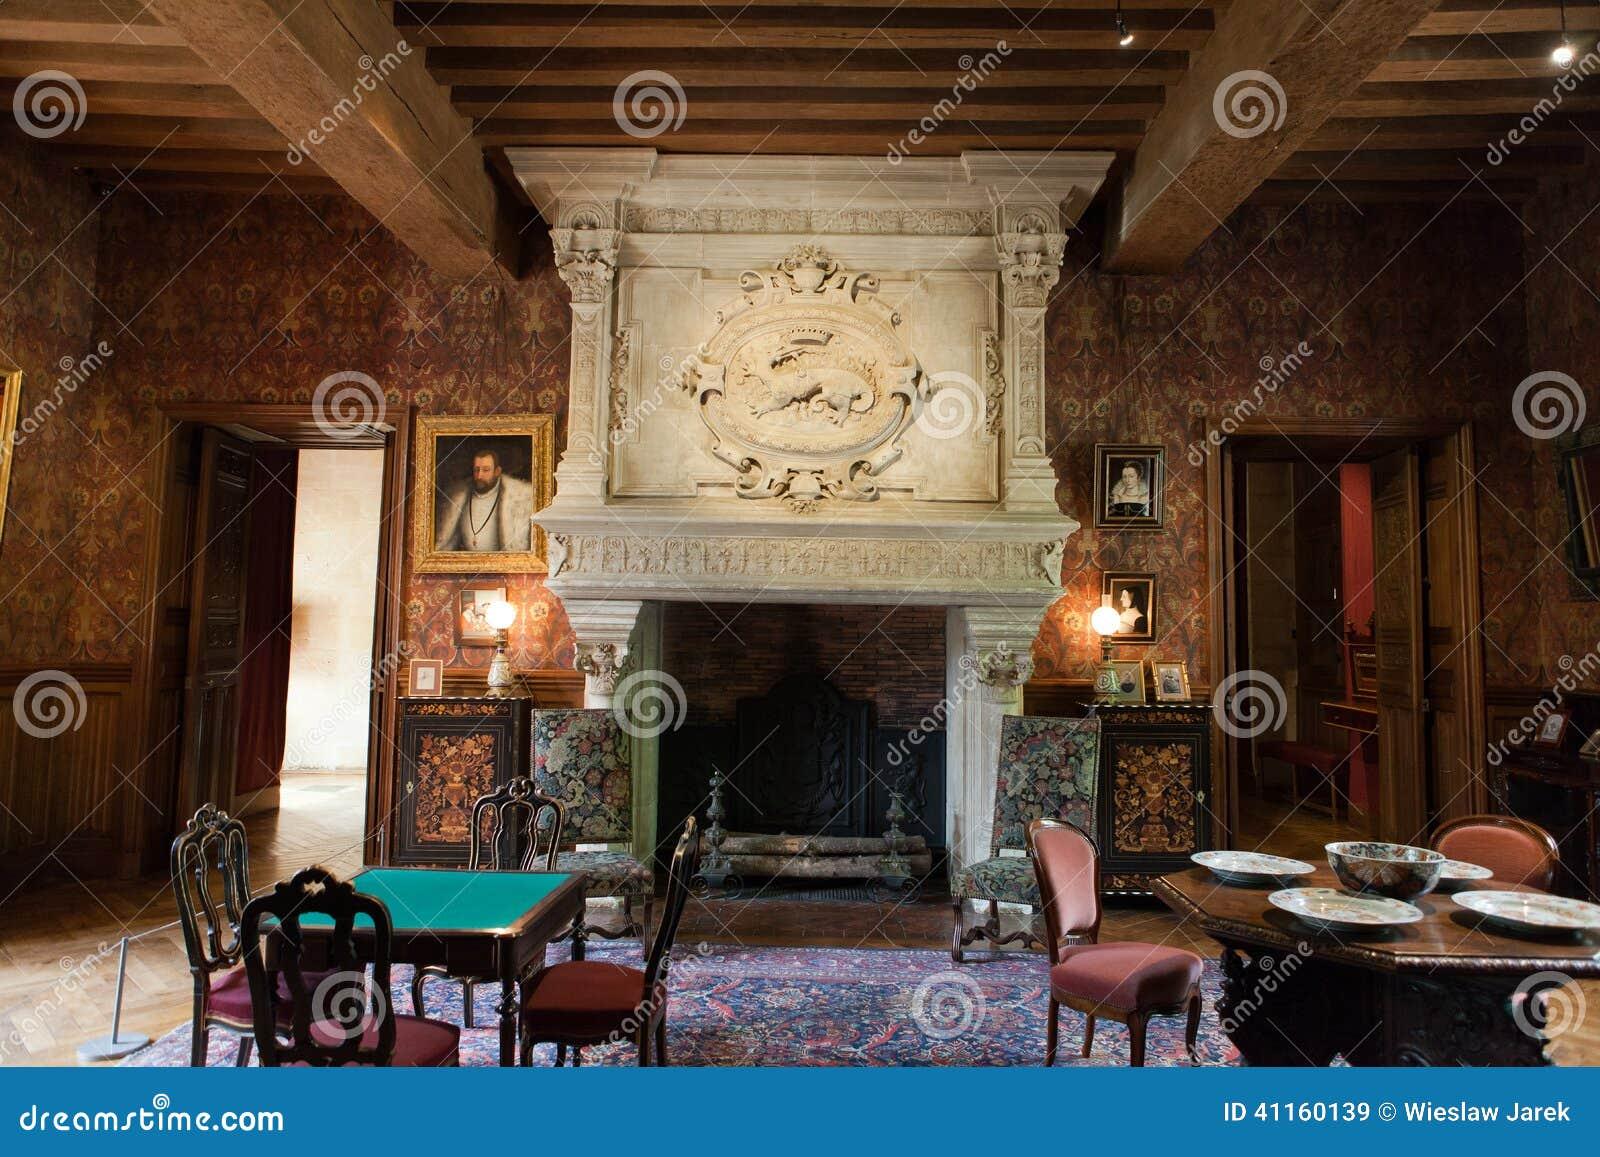 Interior decoration in castle of azay le rideau stock for Le decor interieur